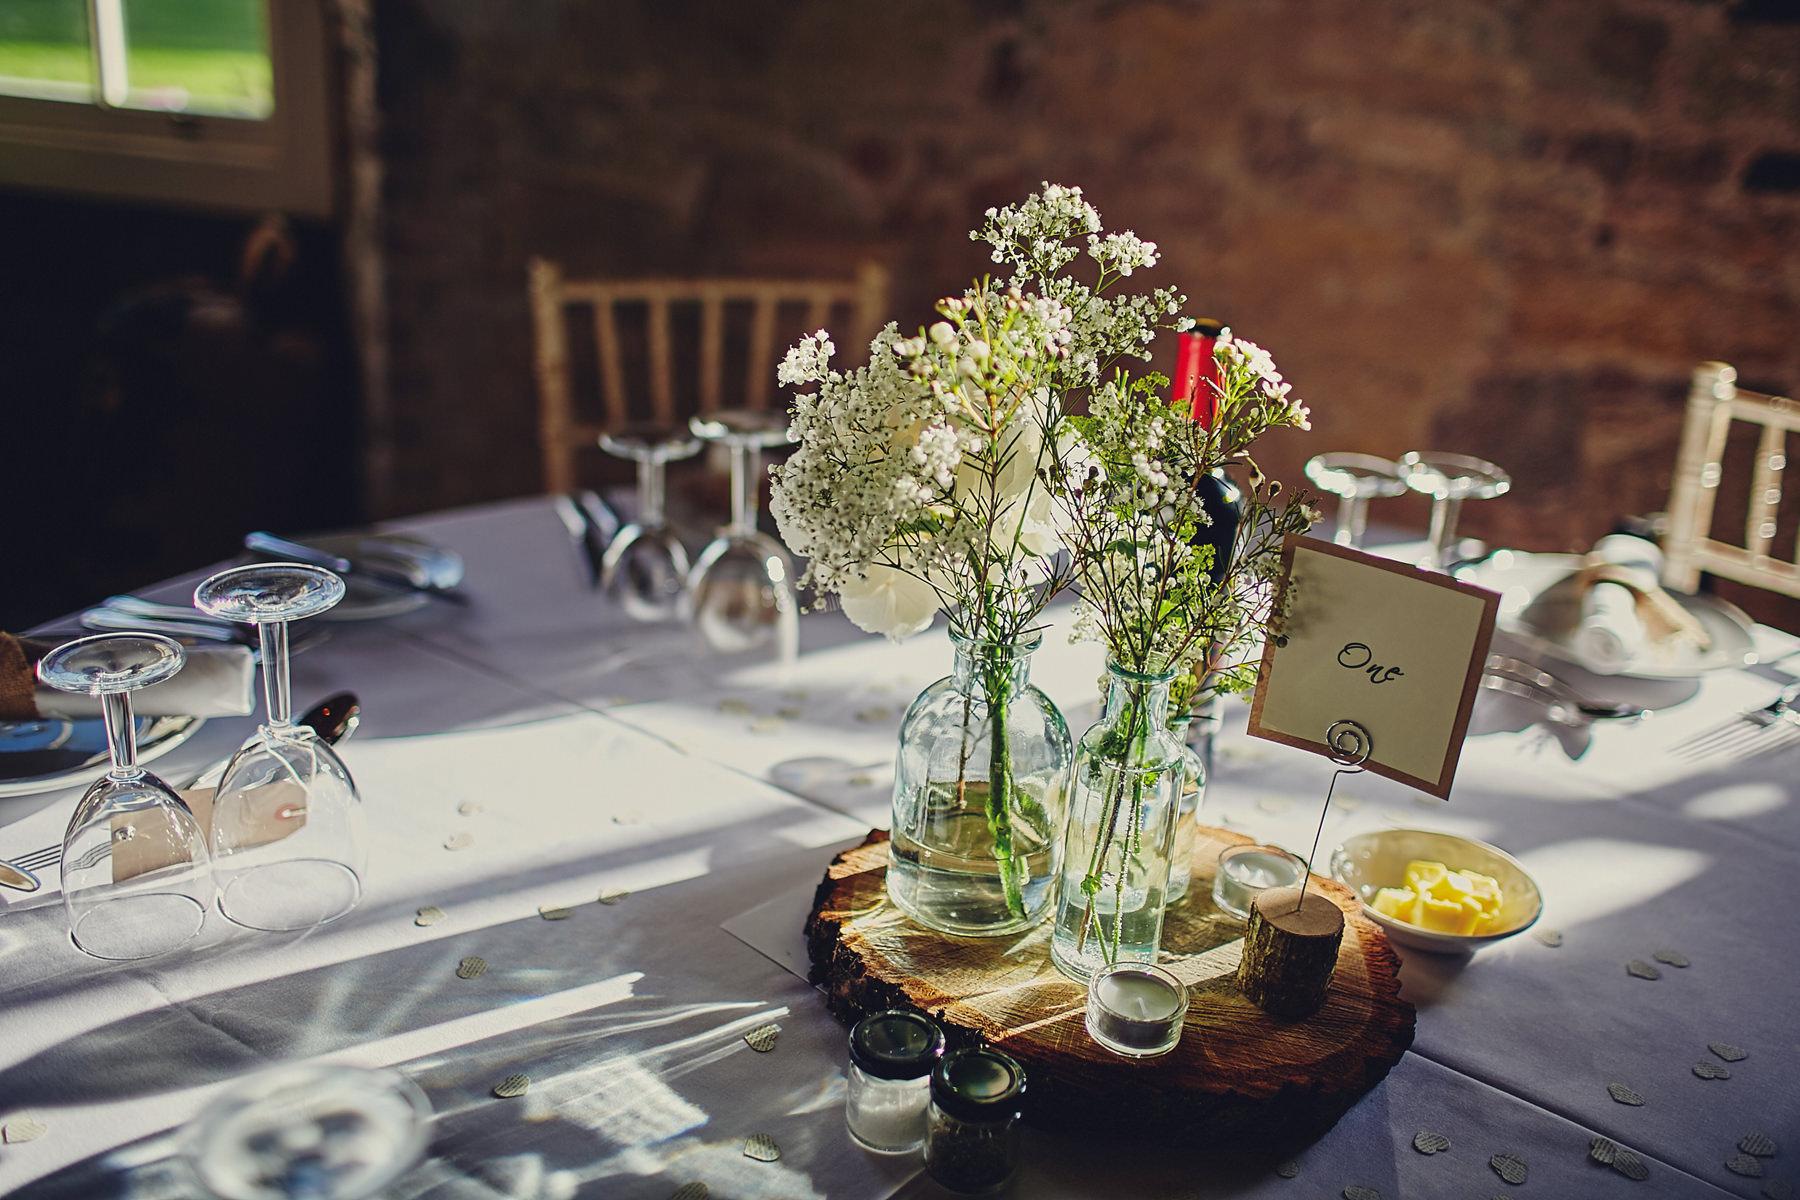 Wedding at Borris House co.Carlow 059 - Borris House wedding | Cara & David